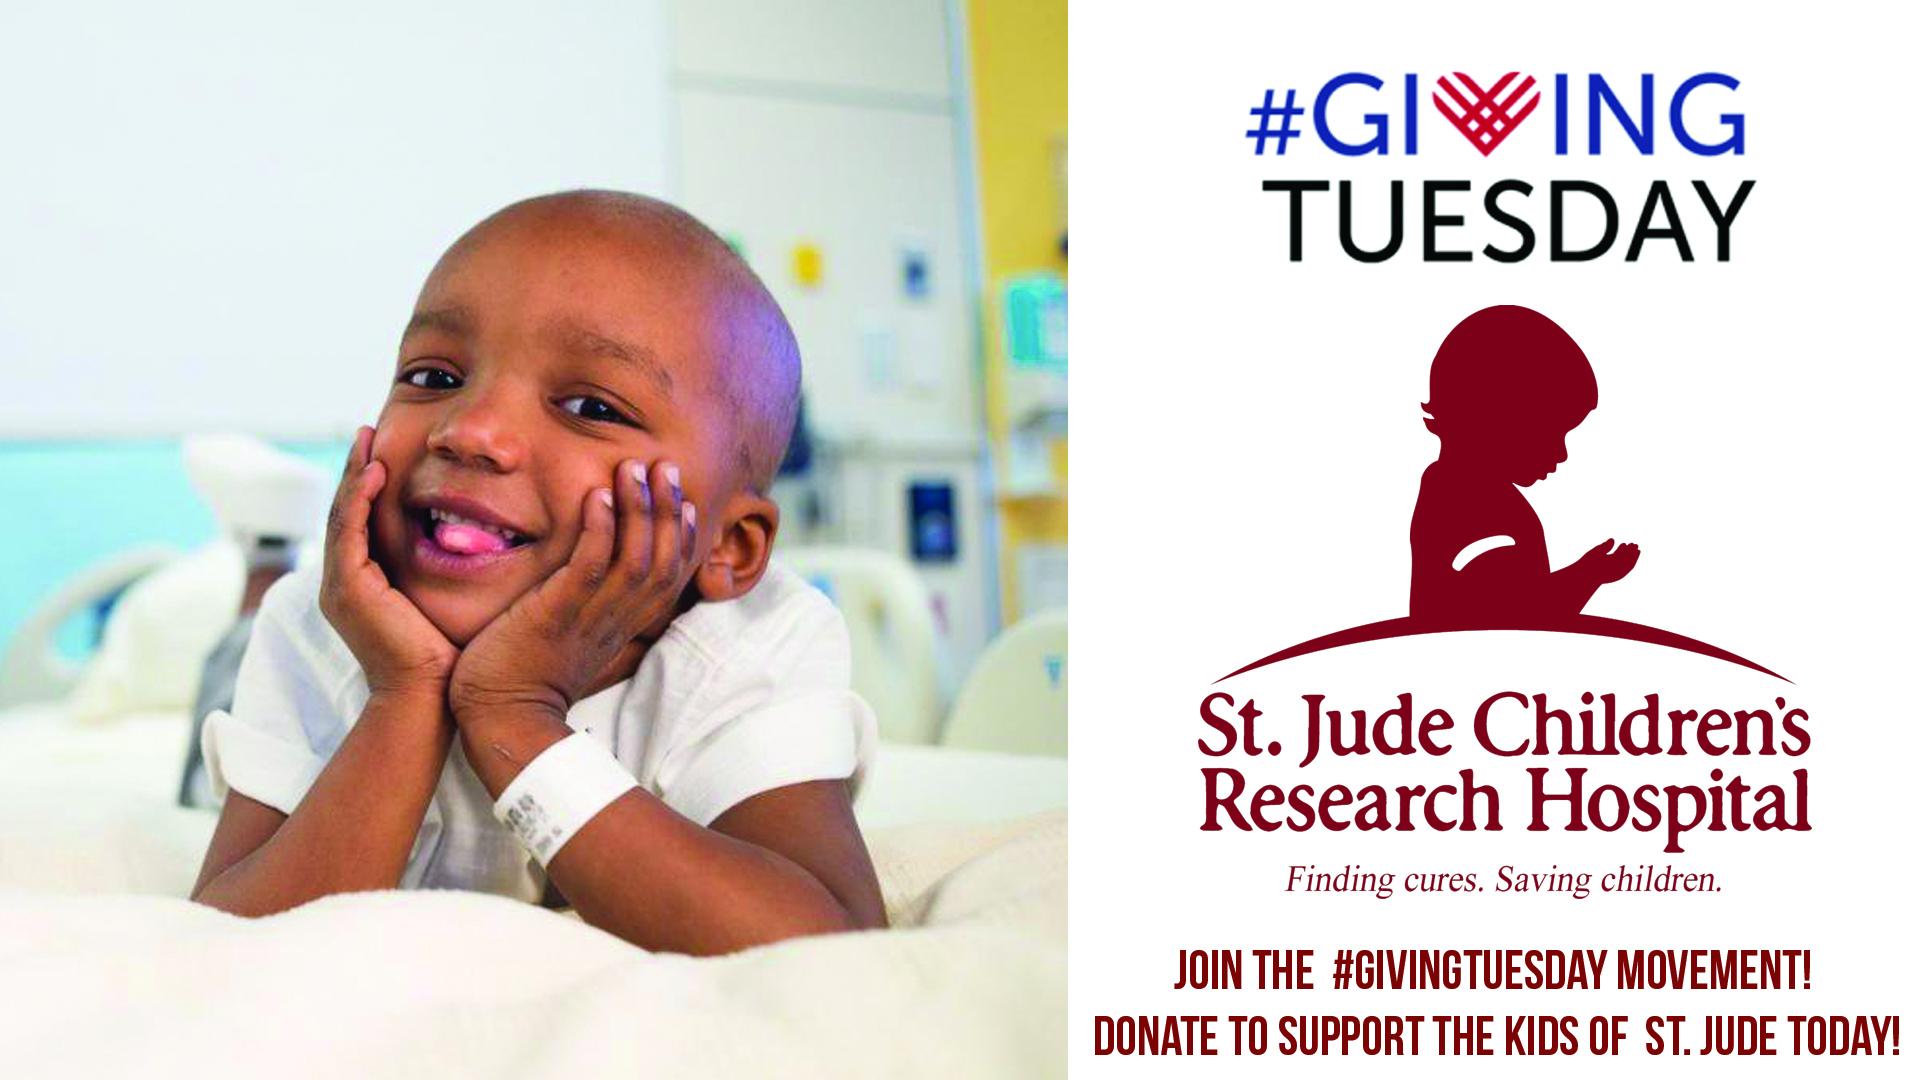 #GivingTuesday - St. Jude